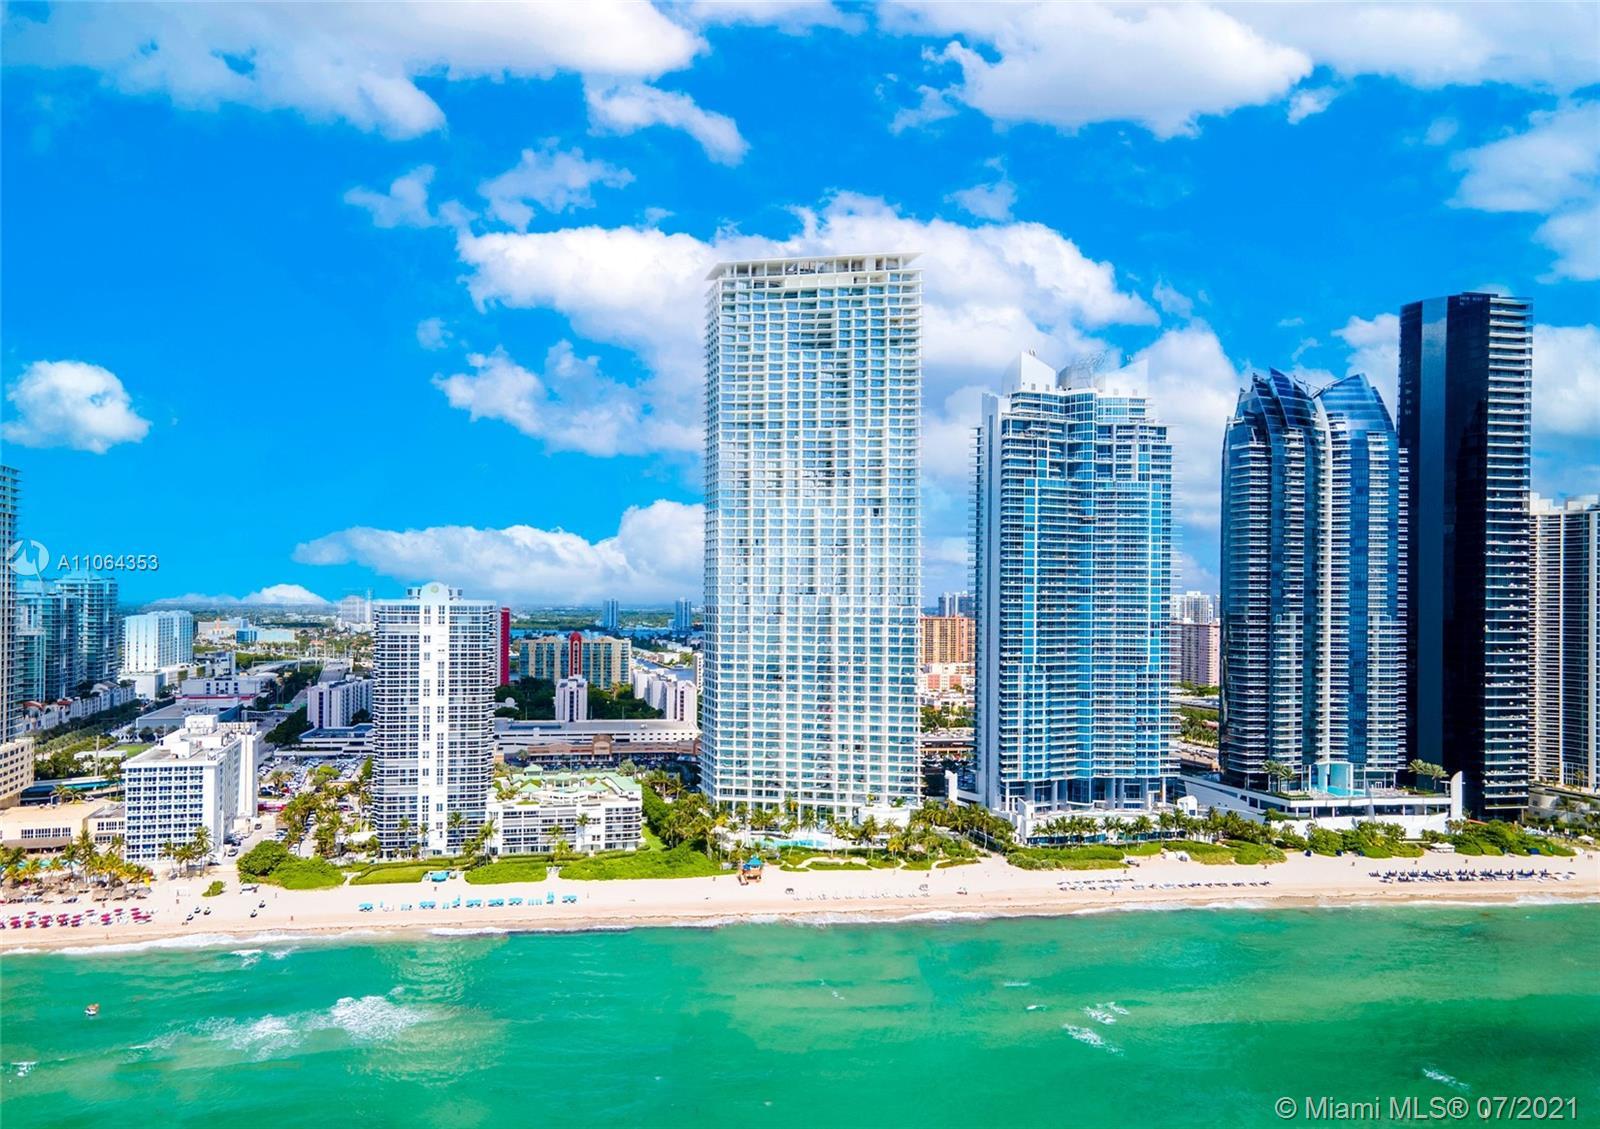 16901 Collins Ave Unit 2603, Sunny Isles Beach, Florida 33160